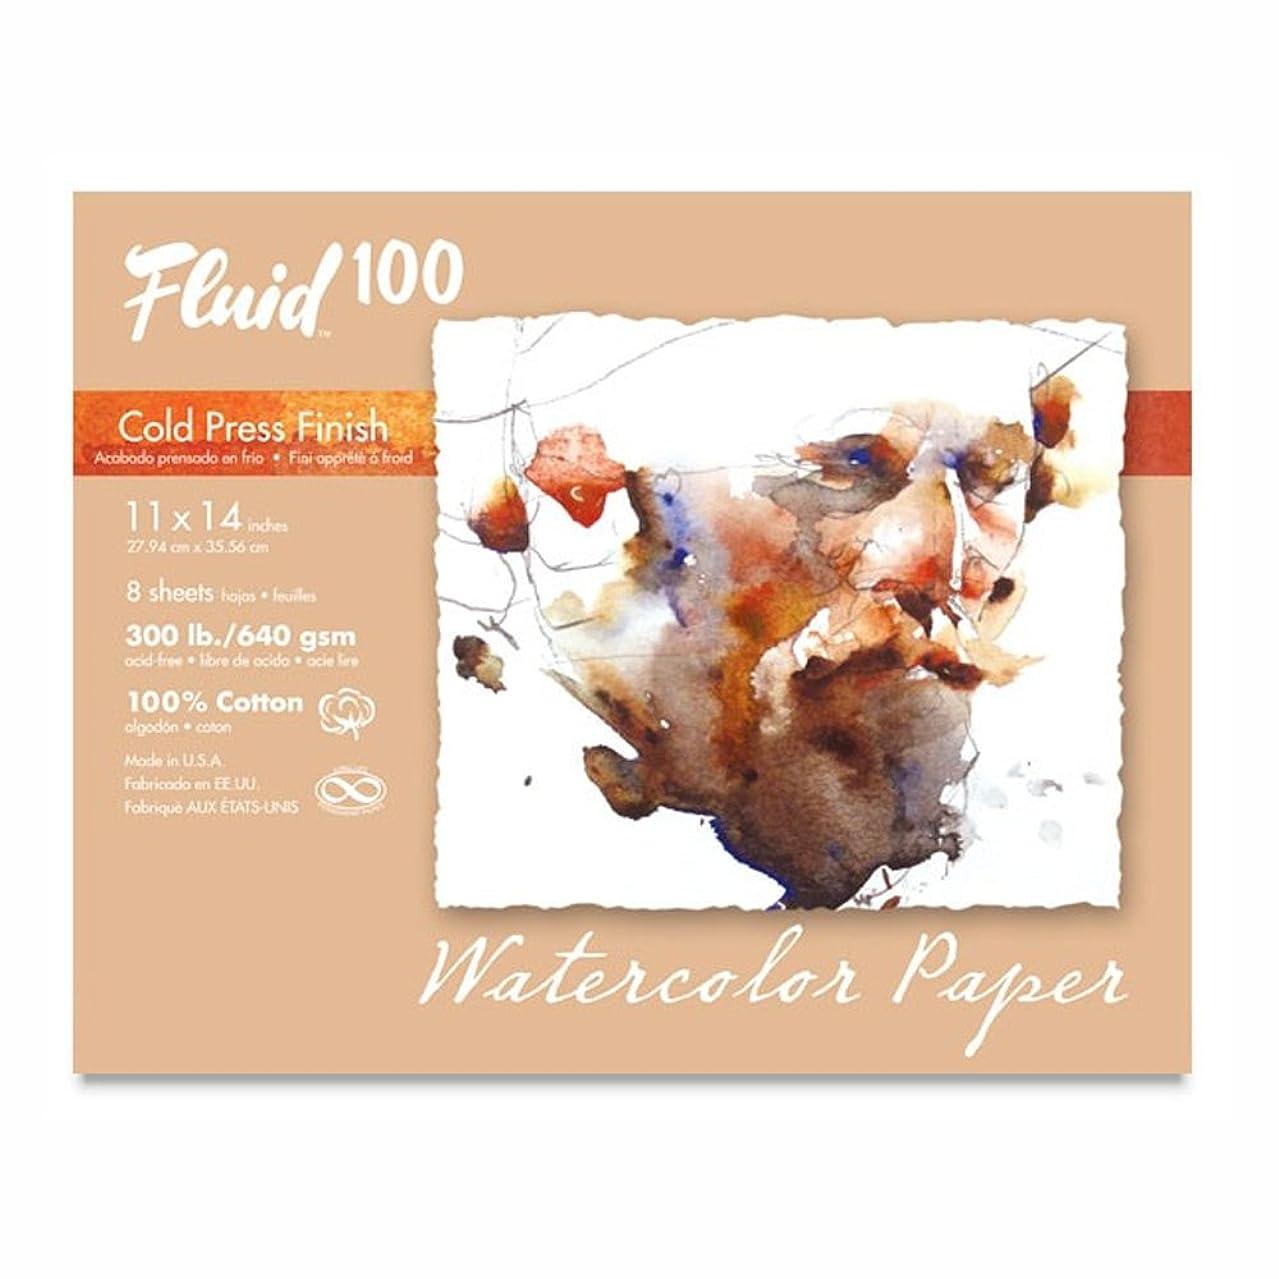 Handbook Paper Fluid 100 Watercolor Cp 300Lb Pochette 11X14